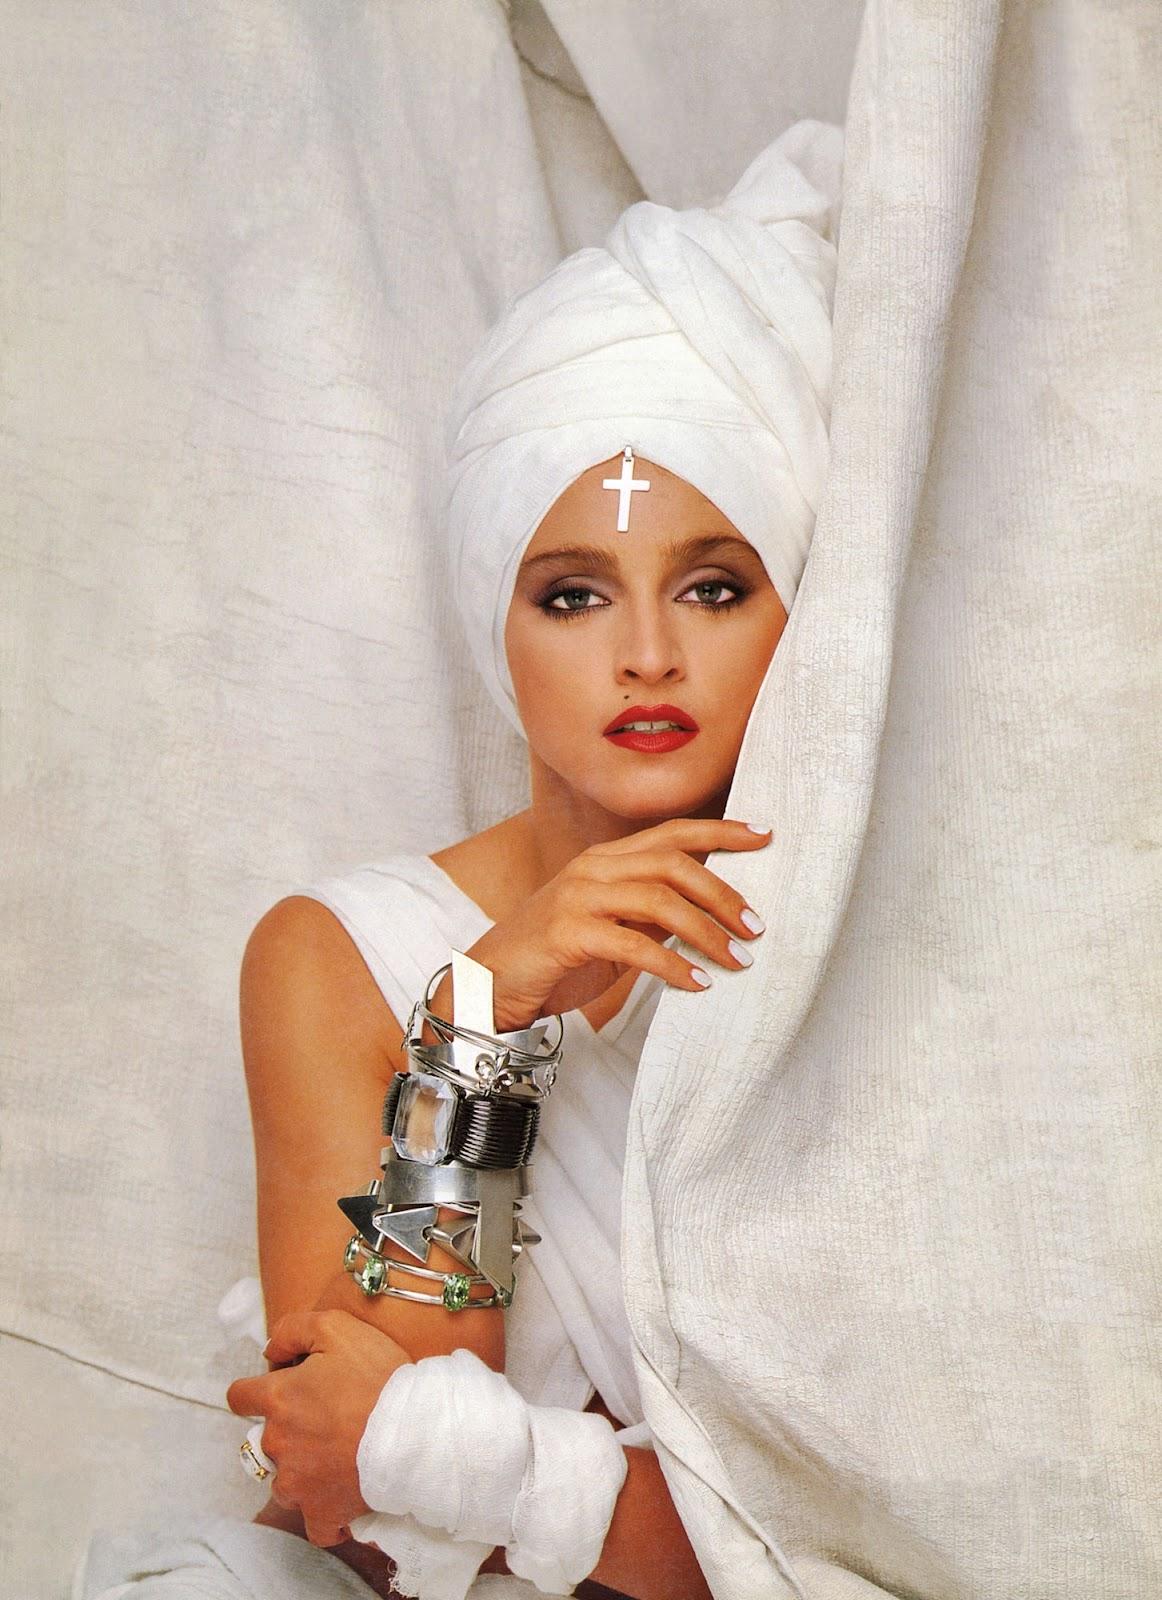 http://2.bp.blogspot.com/-cWtJM2OvjpU/UBW00sM9TnI/AAAAAAAABKg/u1VpyYKxsug/s1600/Madonna+-+Herb+Ritts+1986.jpg